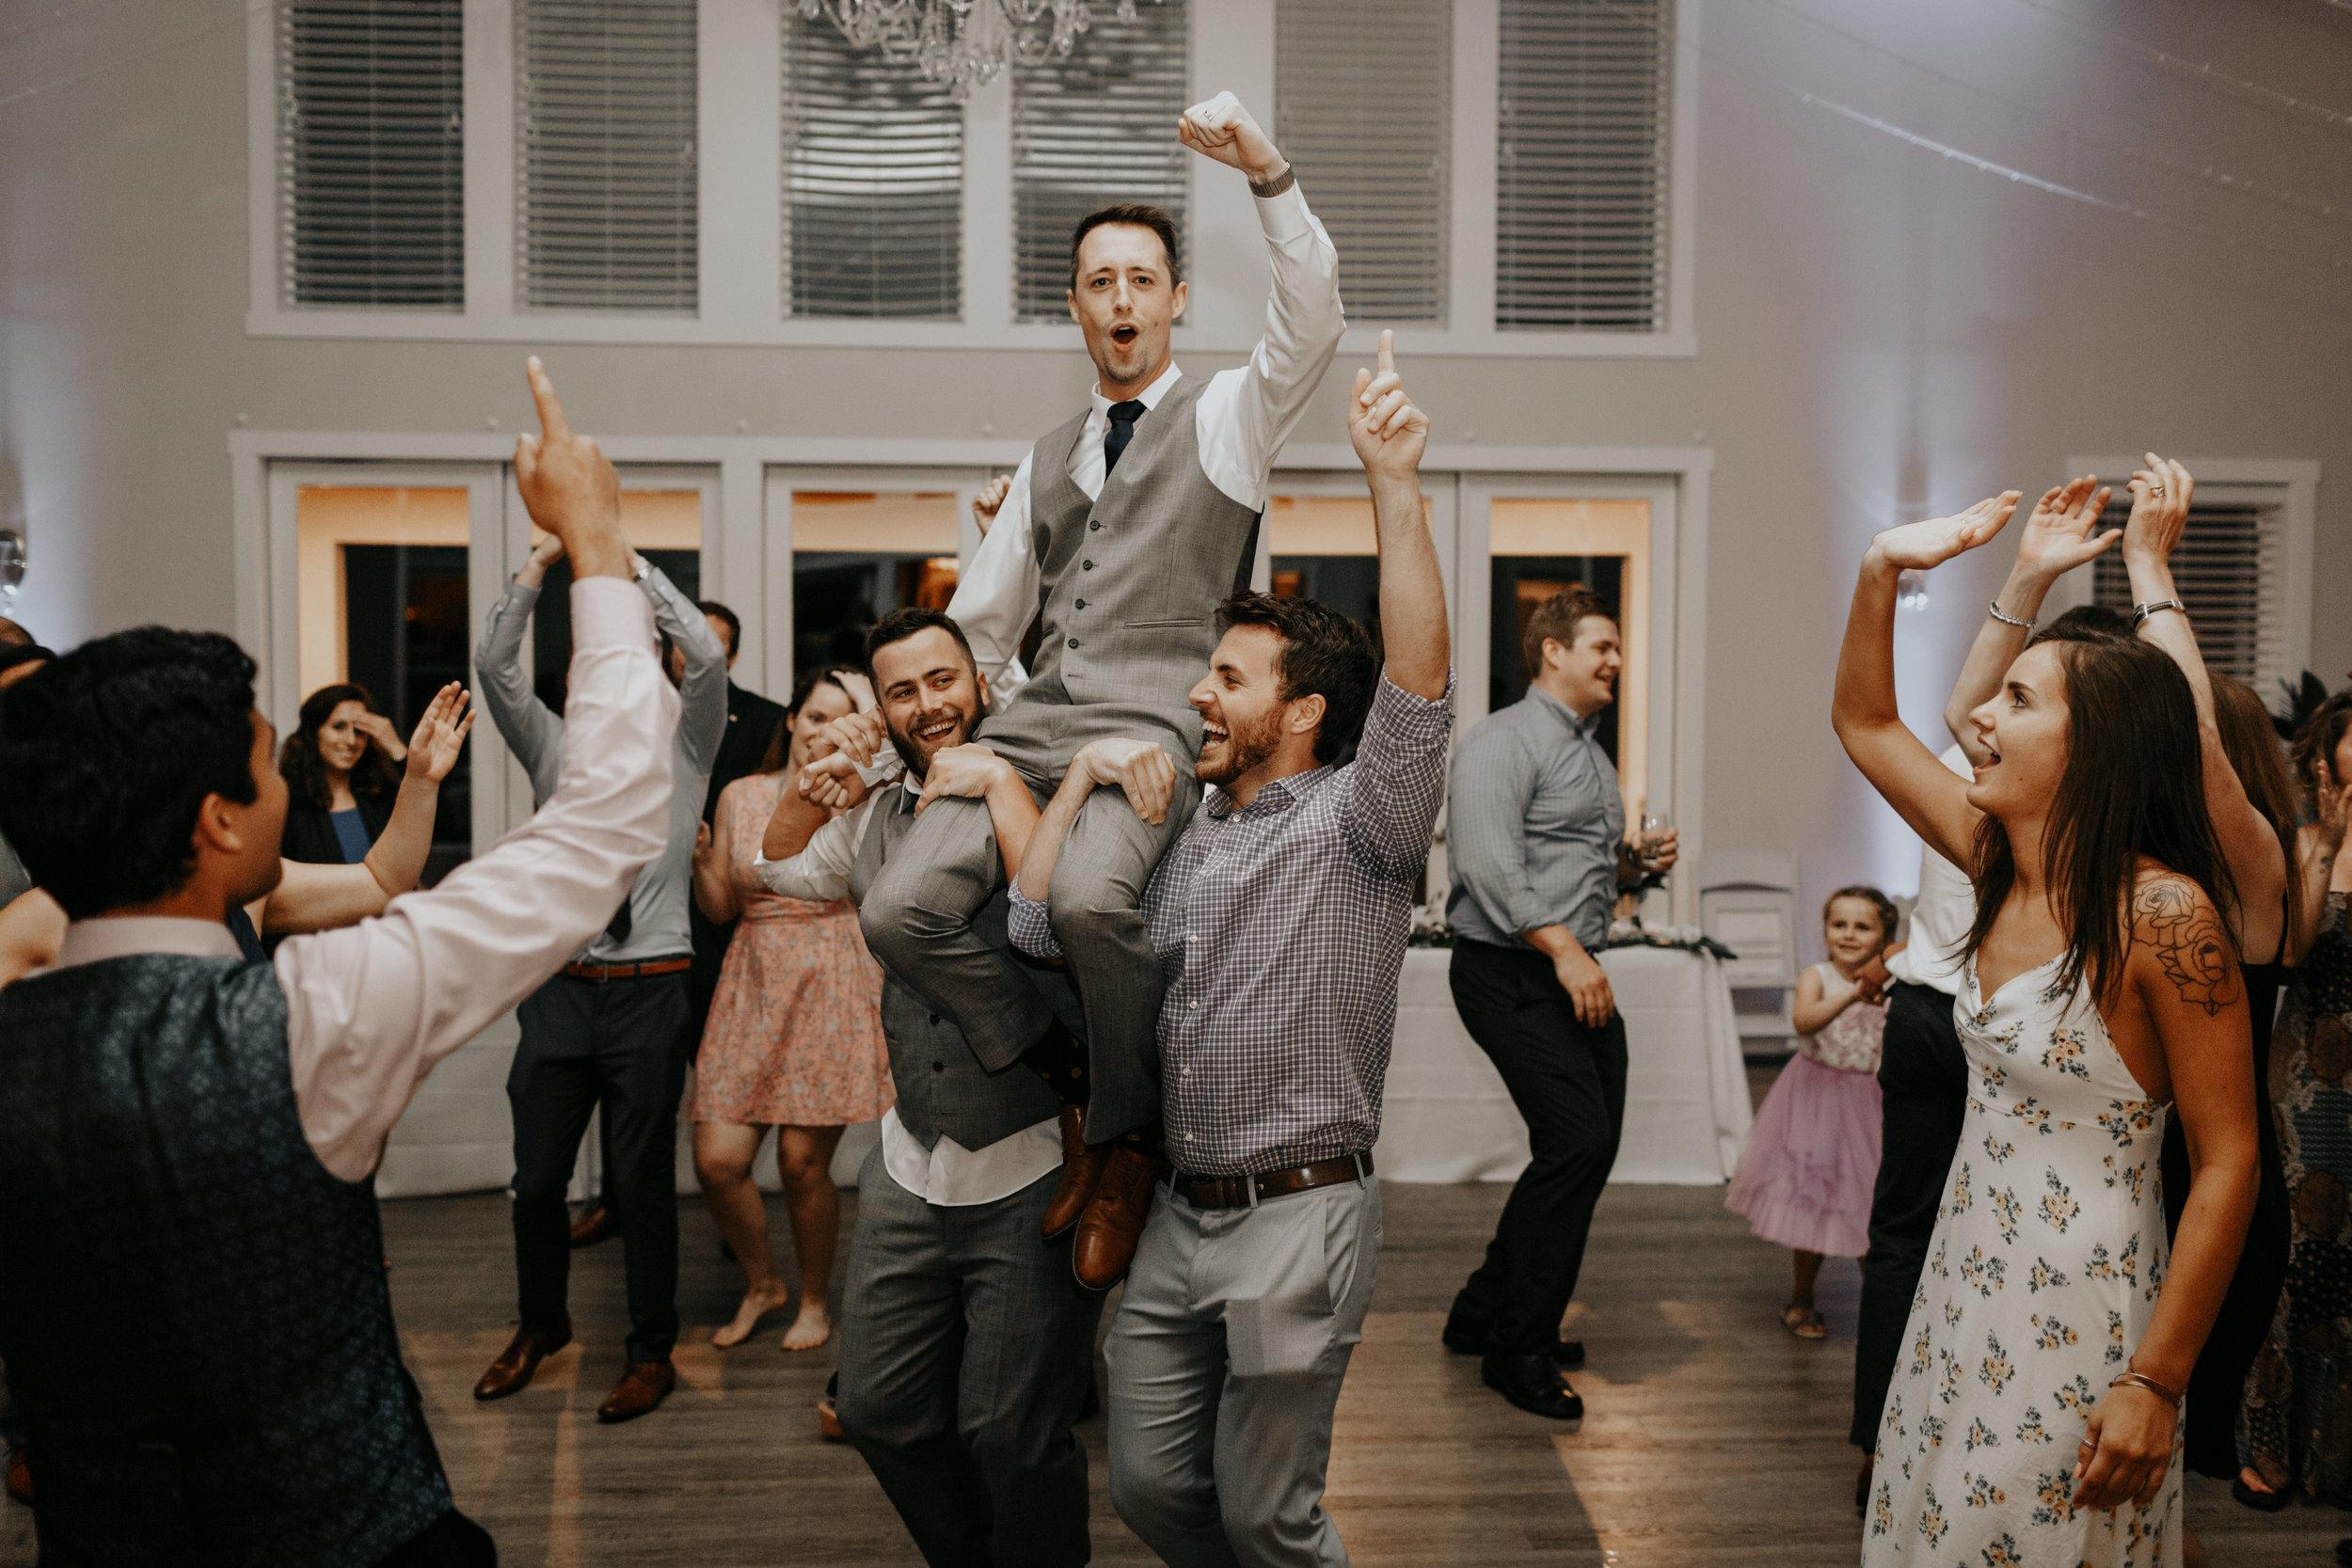 ginapaulson_eriksarah_wedding-1293.jpg